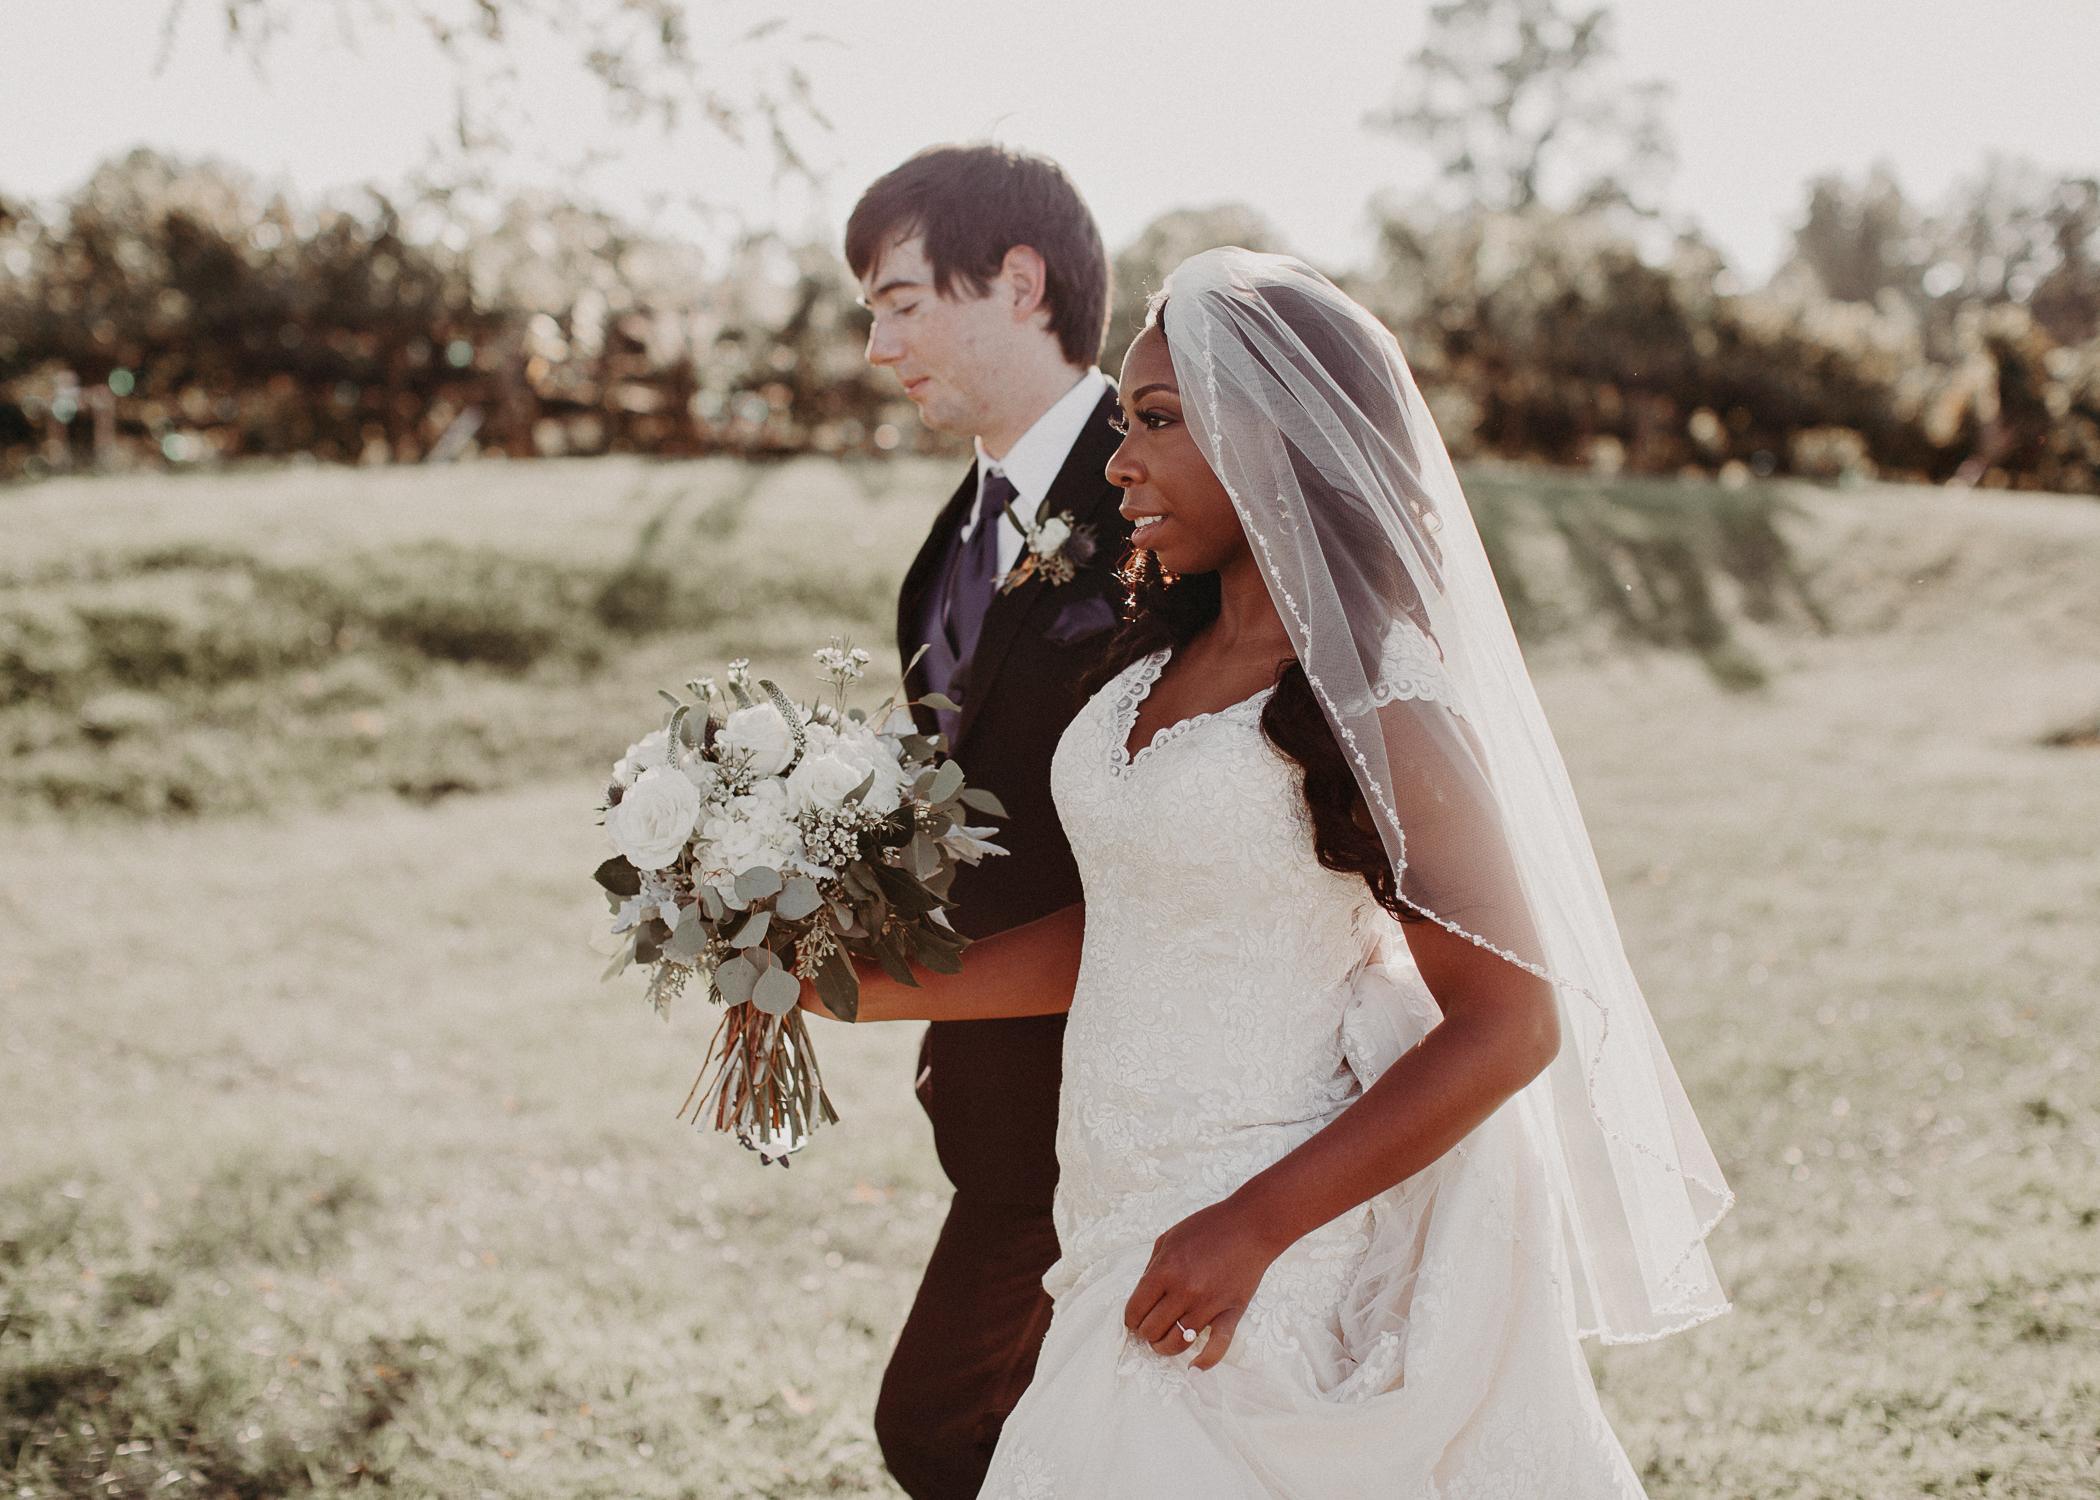 45- Kaya_vineyard_dahlonega_wedding_venue_Bride_and_groom_first_look_and_portraits_aline_marin_photography.jpg